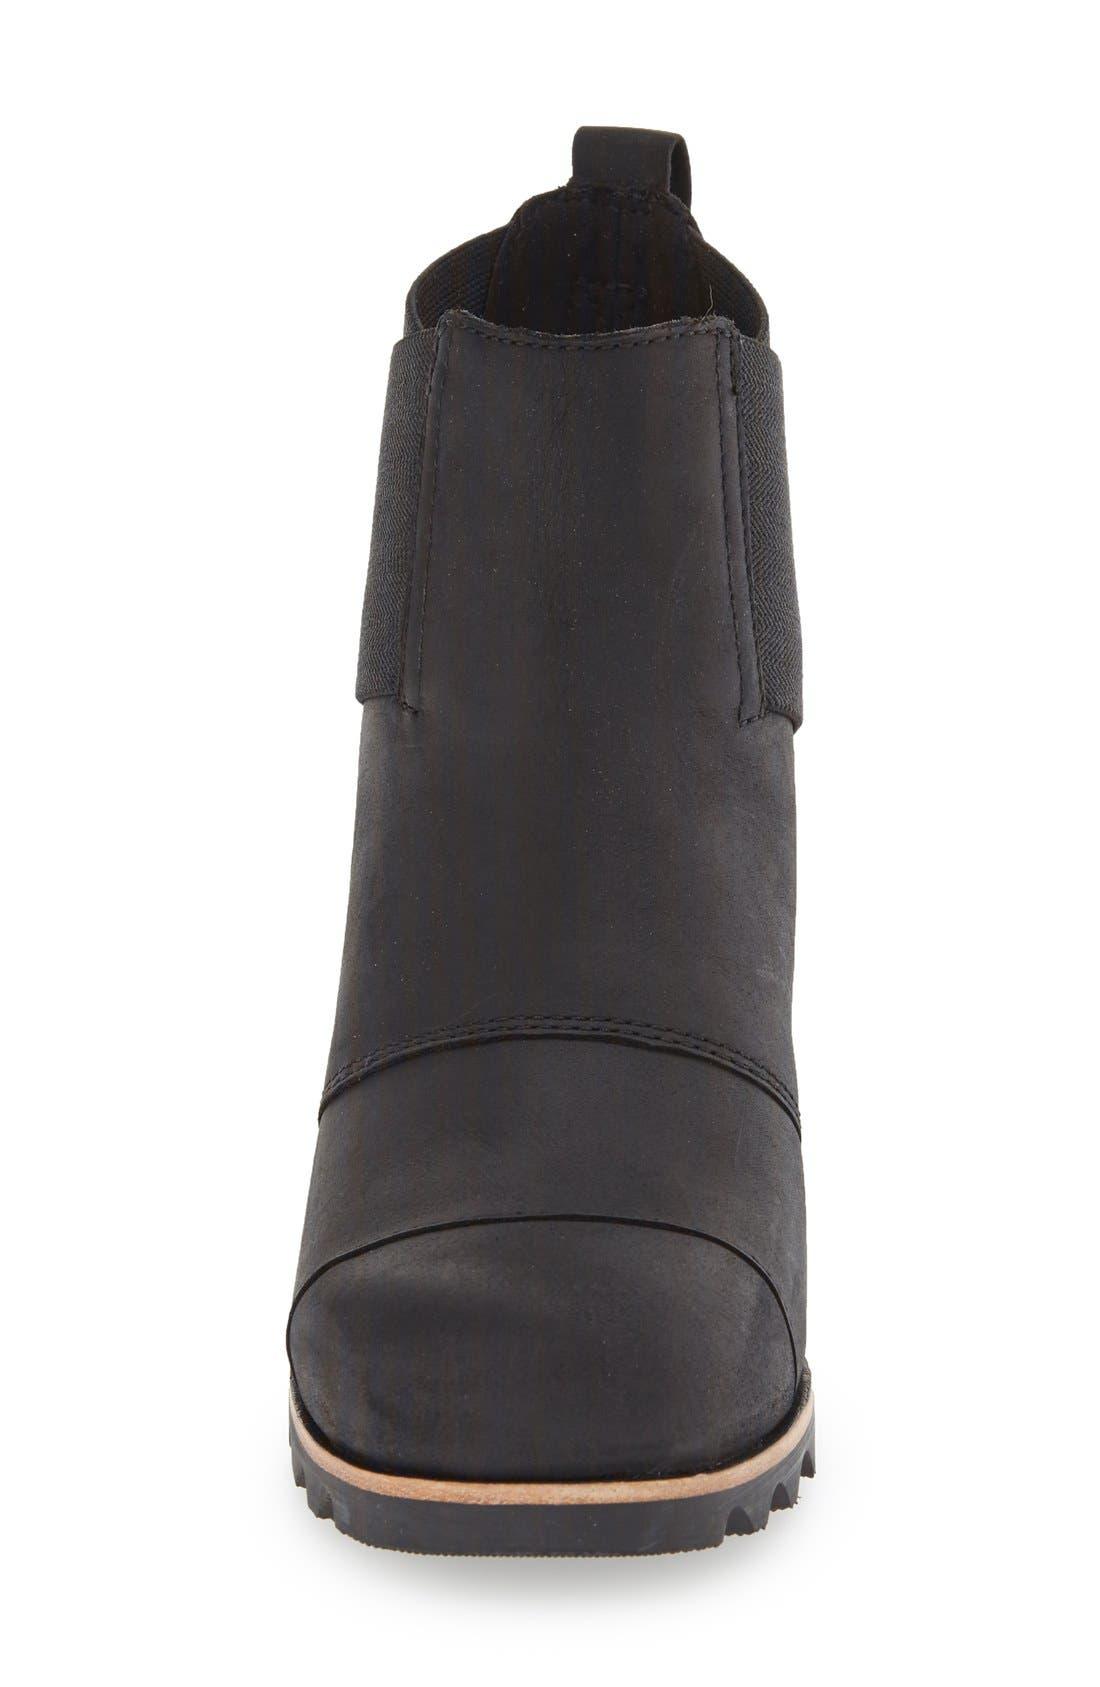 Alternate Image 3  - SOREL 'Addington' Waterproof Chelsea Boot (Women)